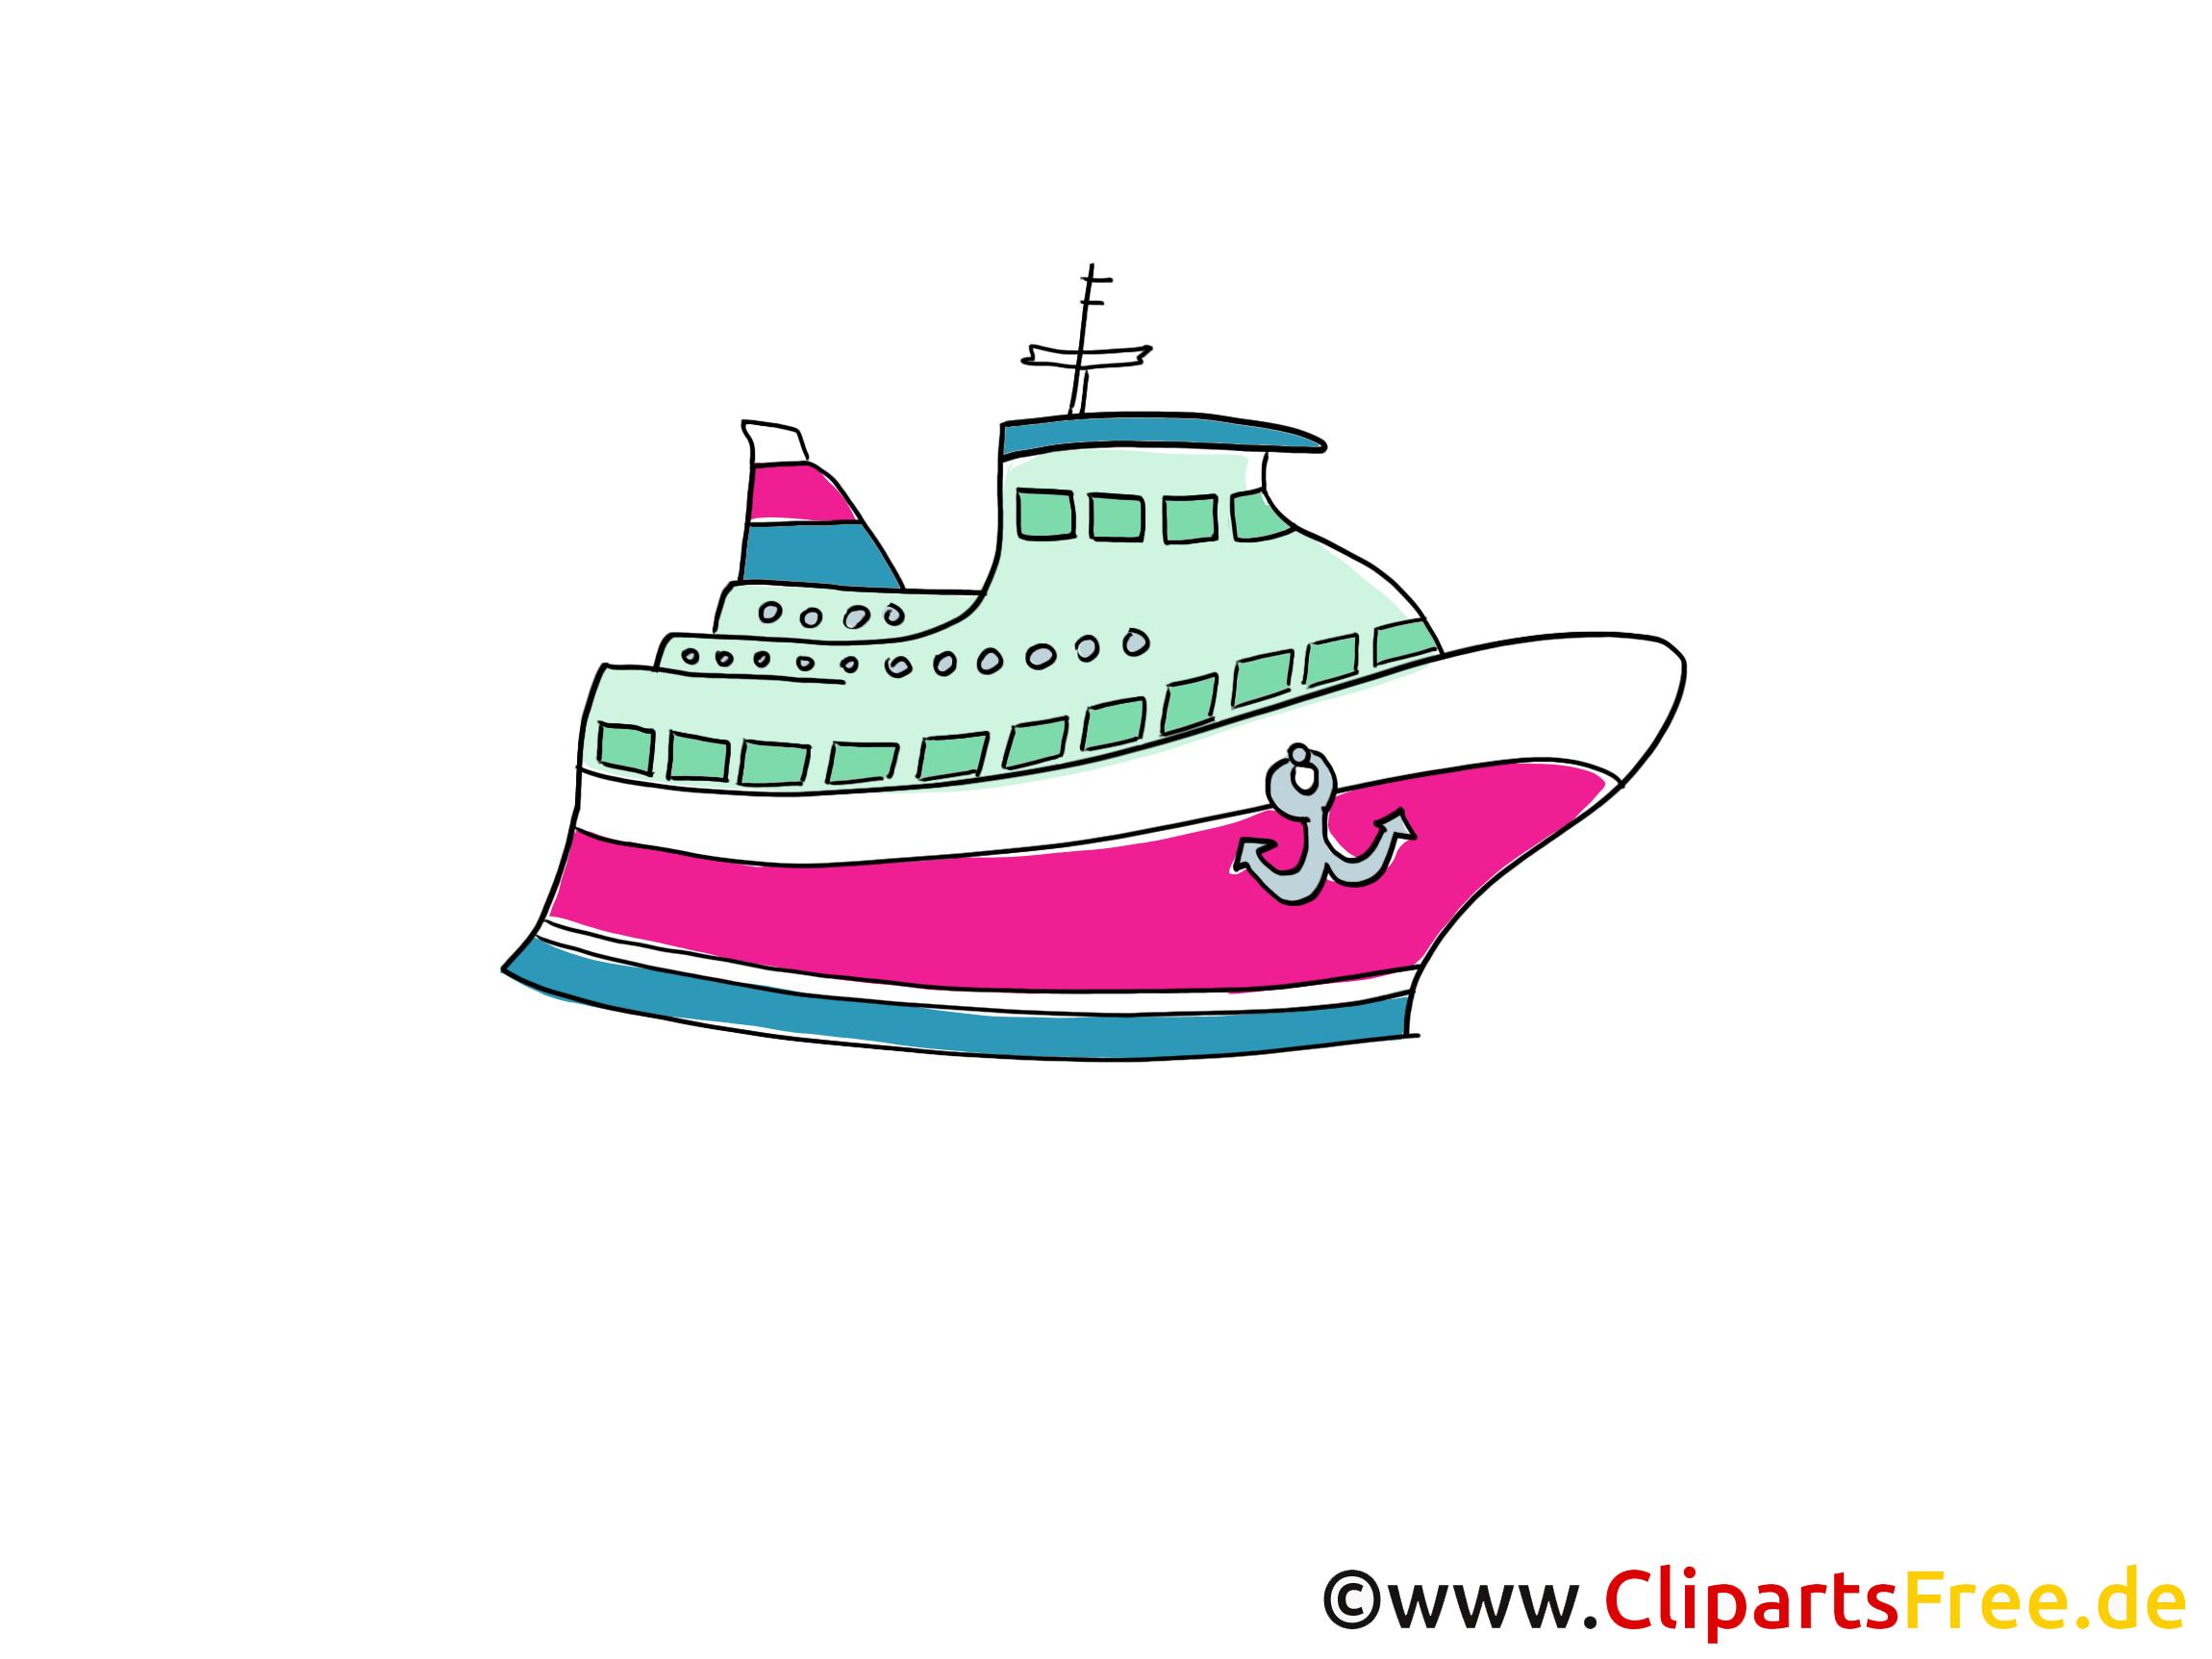 Cruise ship clip art, image, comic, cartoon, pic free